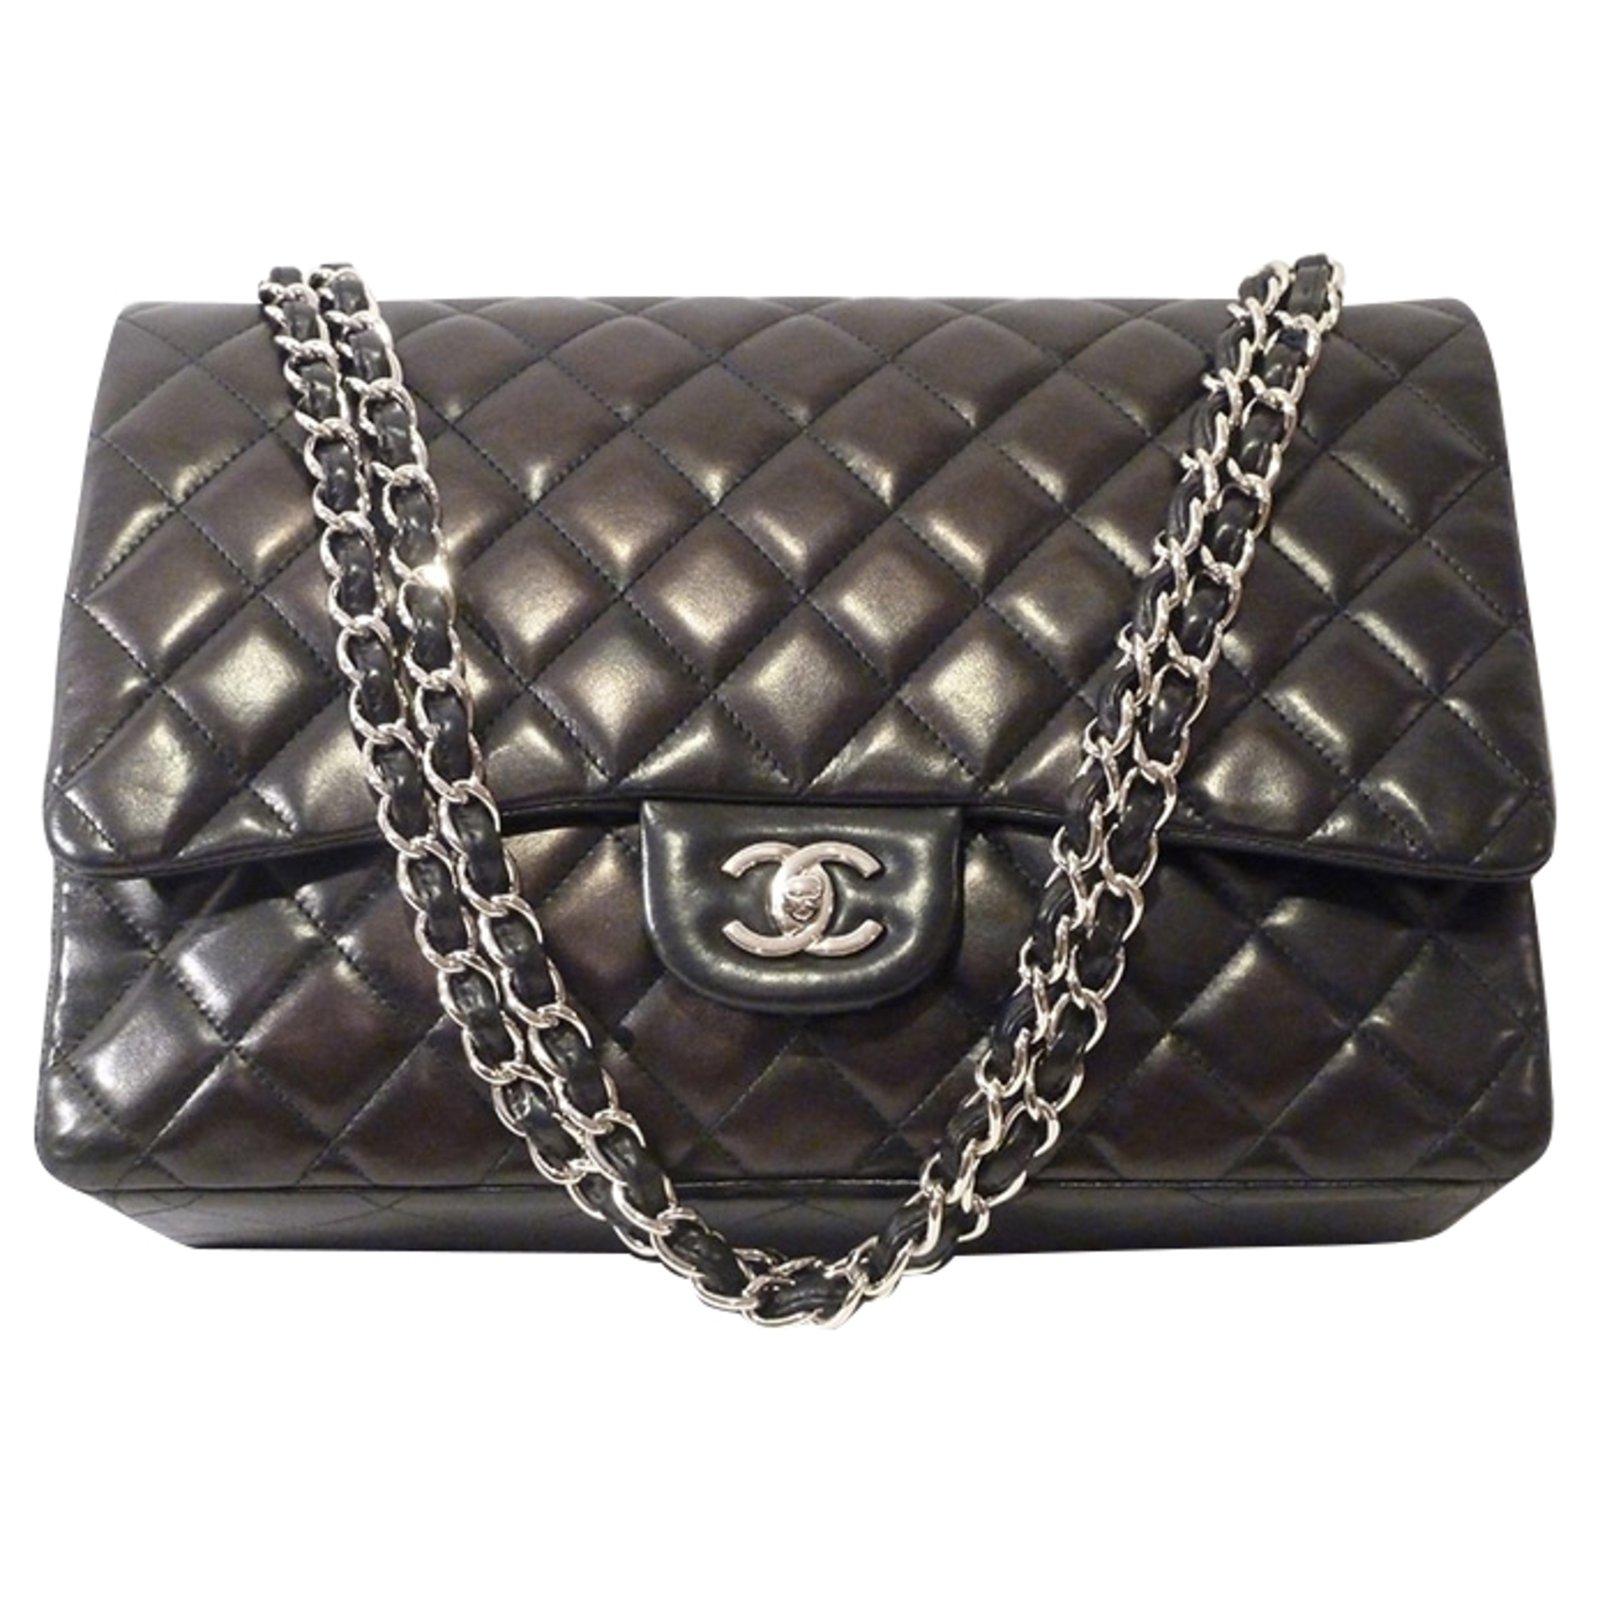 83fe84bca9cc Chanel Chanel Maxi Classic Flap Shoulder Bag Handbags Leather Black  ref.49018